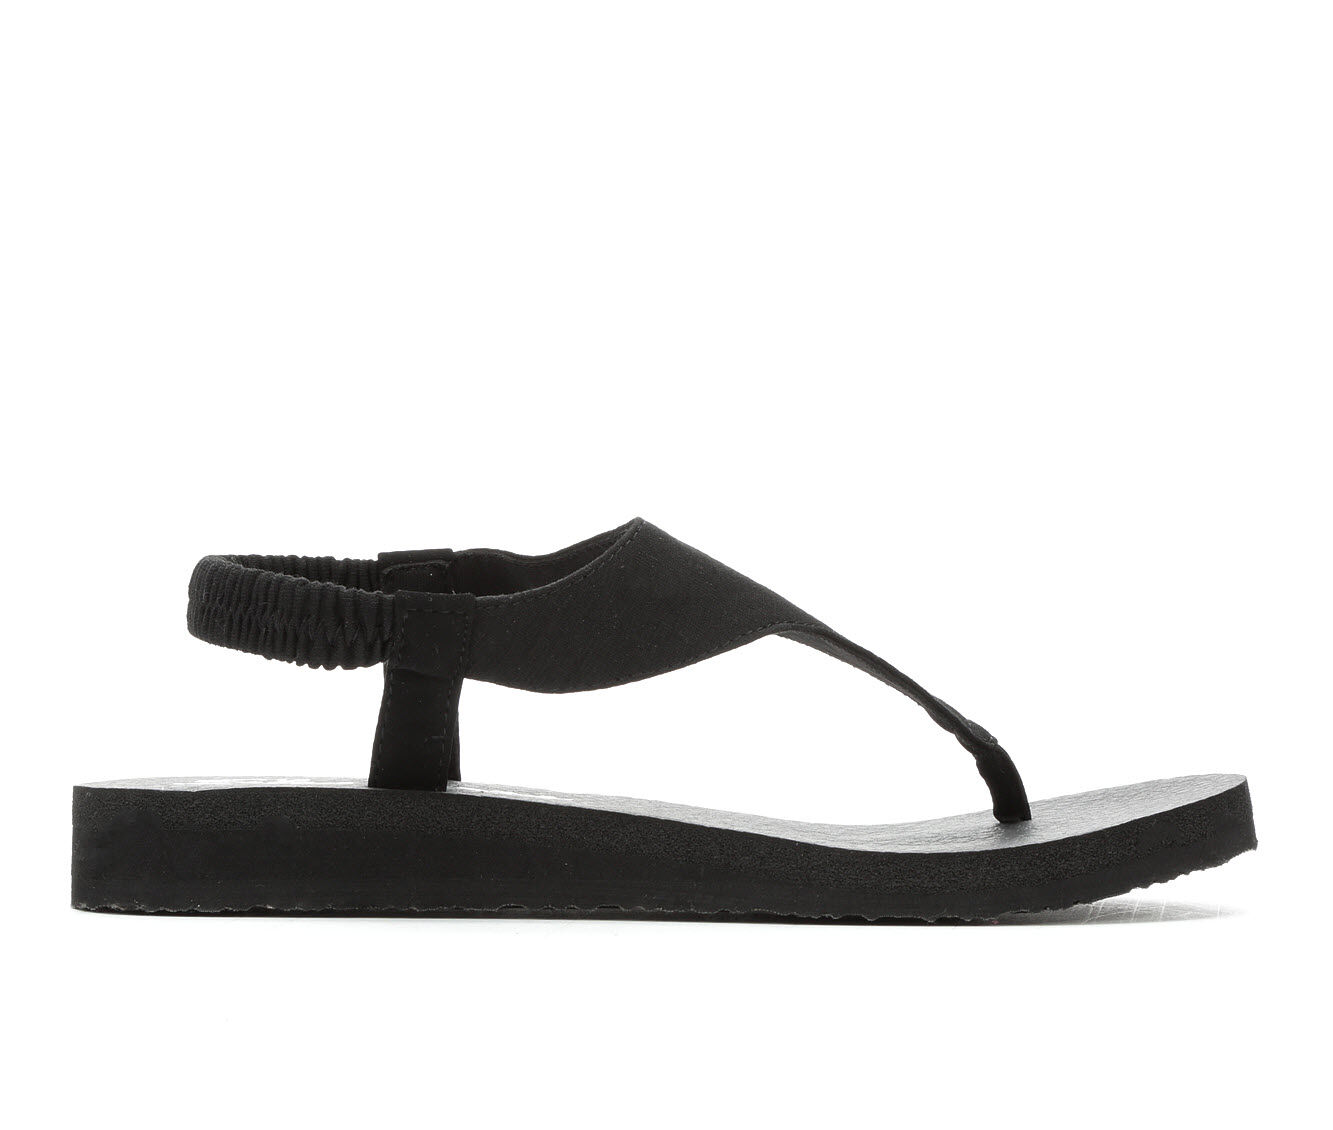 cheap sale Women's Skechers Cali Meditation Flow Nat Sandals Twilight Spell